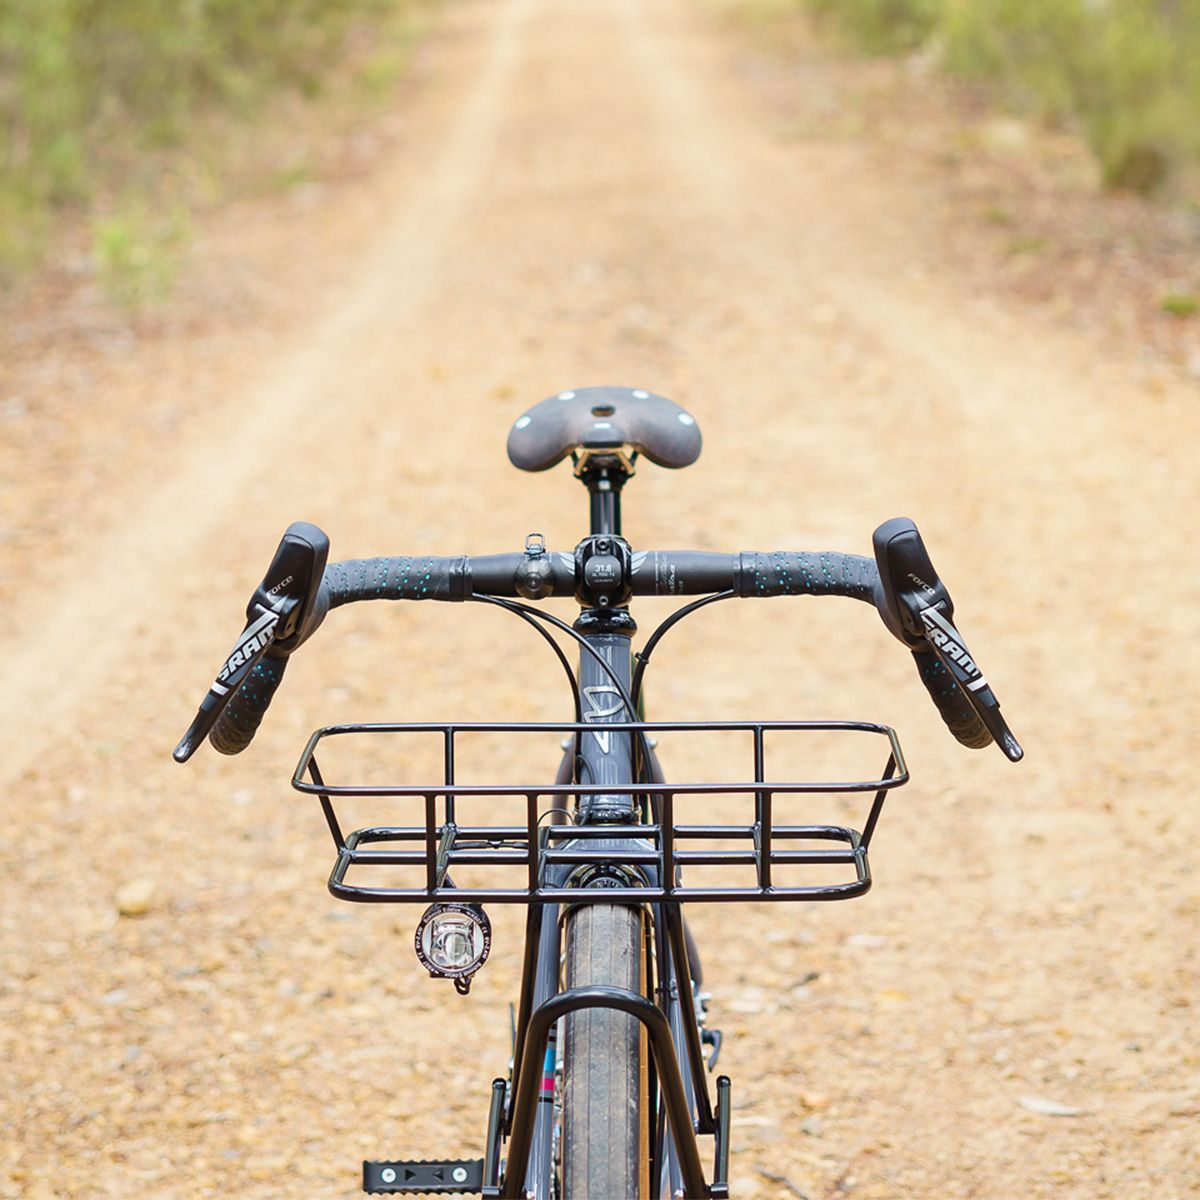 Maiden Australia Lou S 650b Prova Cycles Tourer Touring Bike